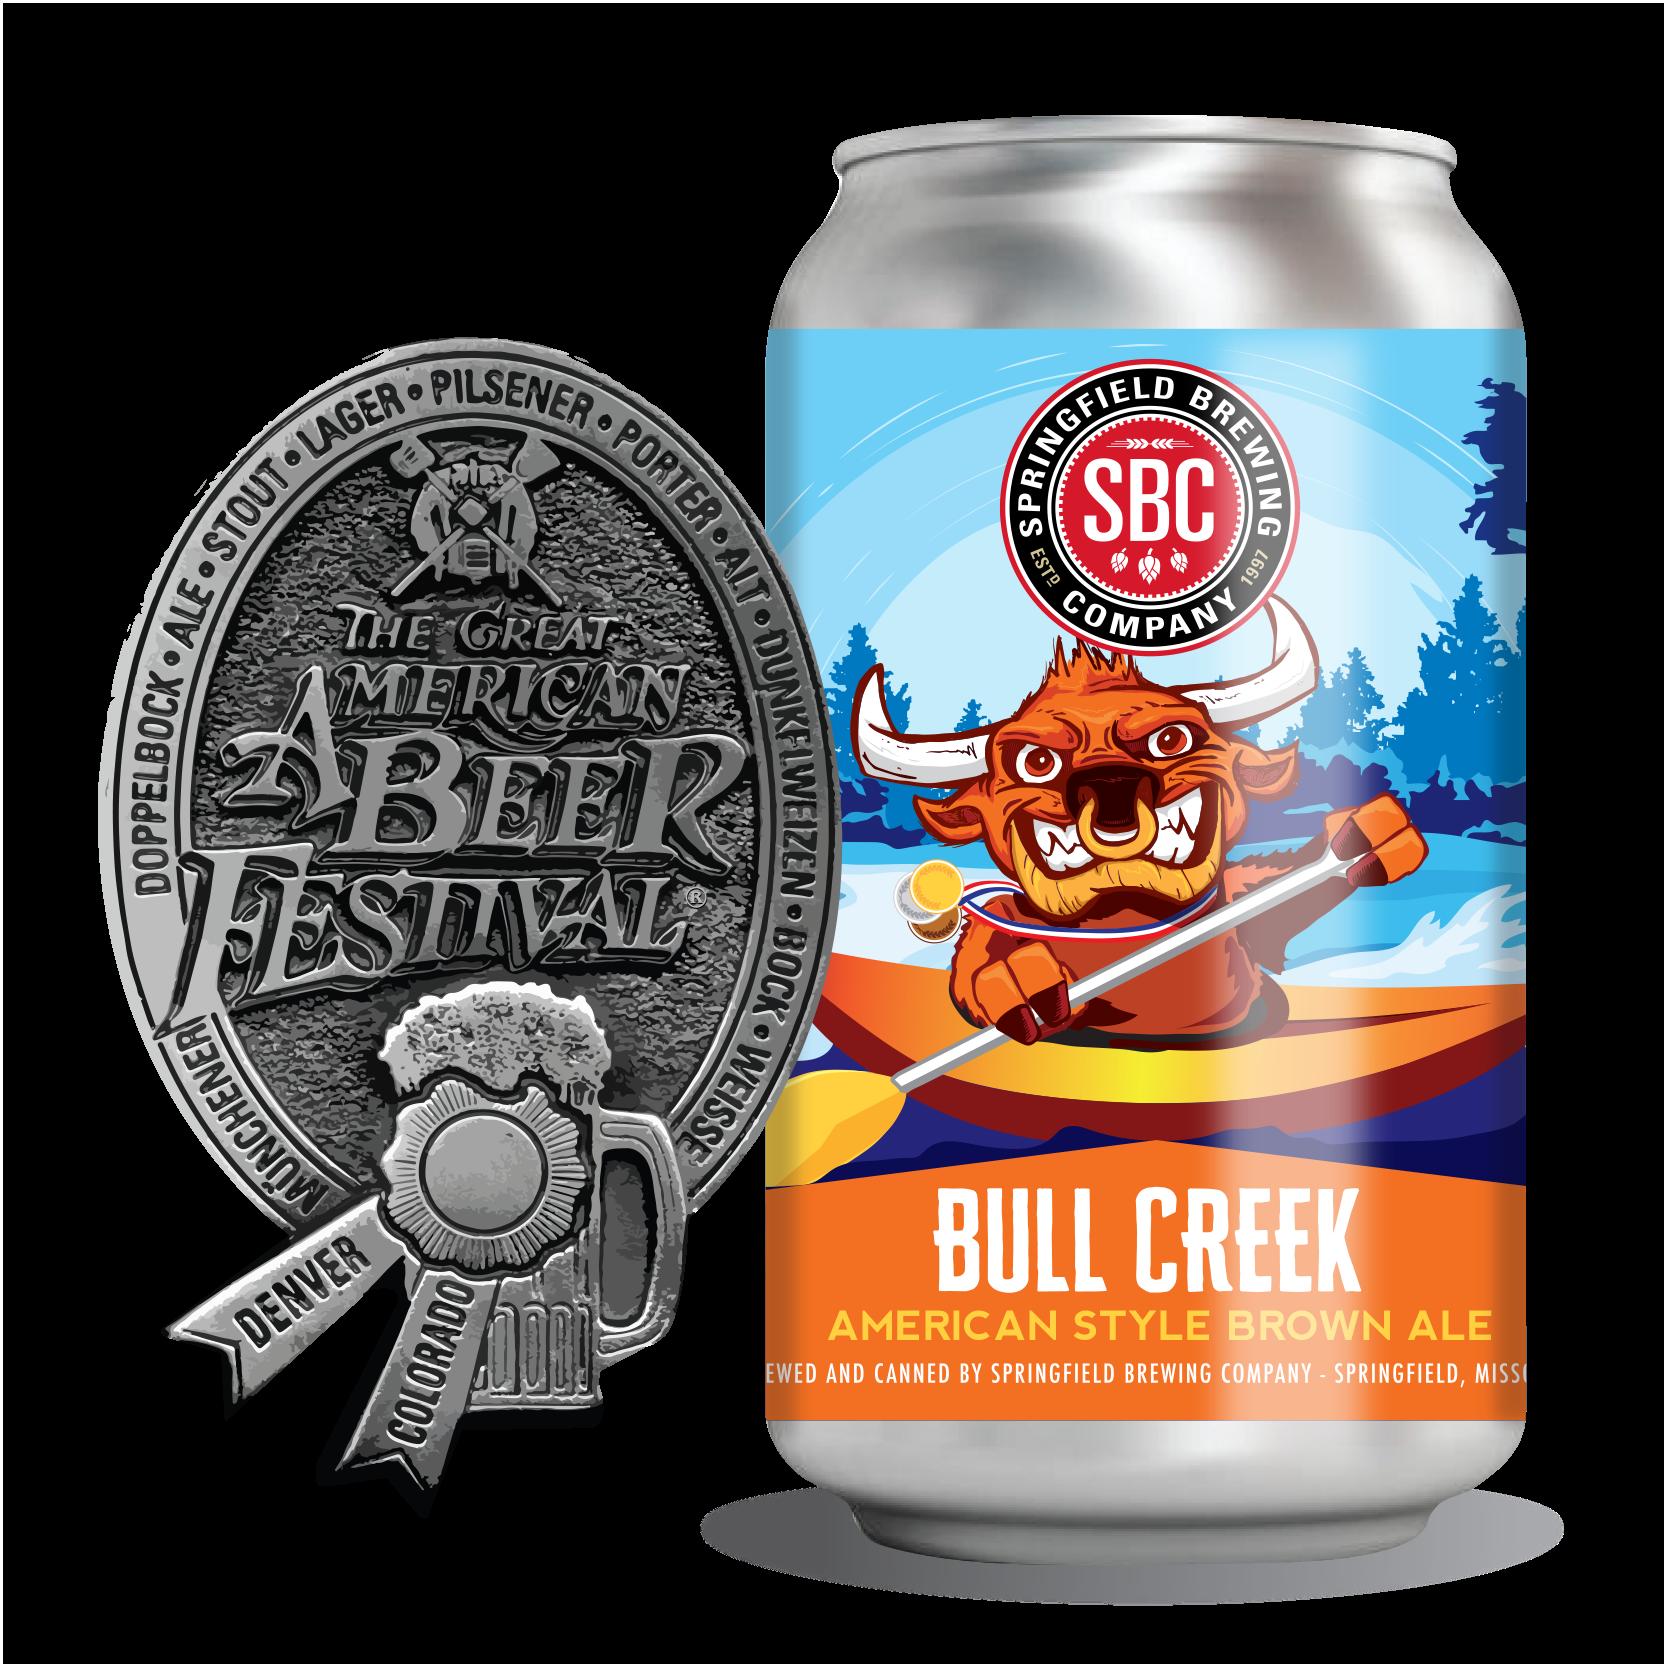 https://brewery.springfieldbrewingco.com/wp-content/uploads/2021/07/GABF_2019BullCreek.png